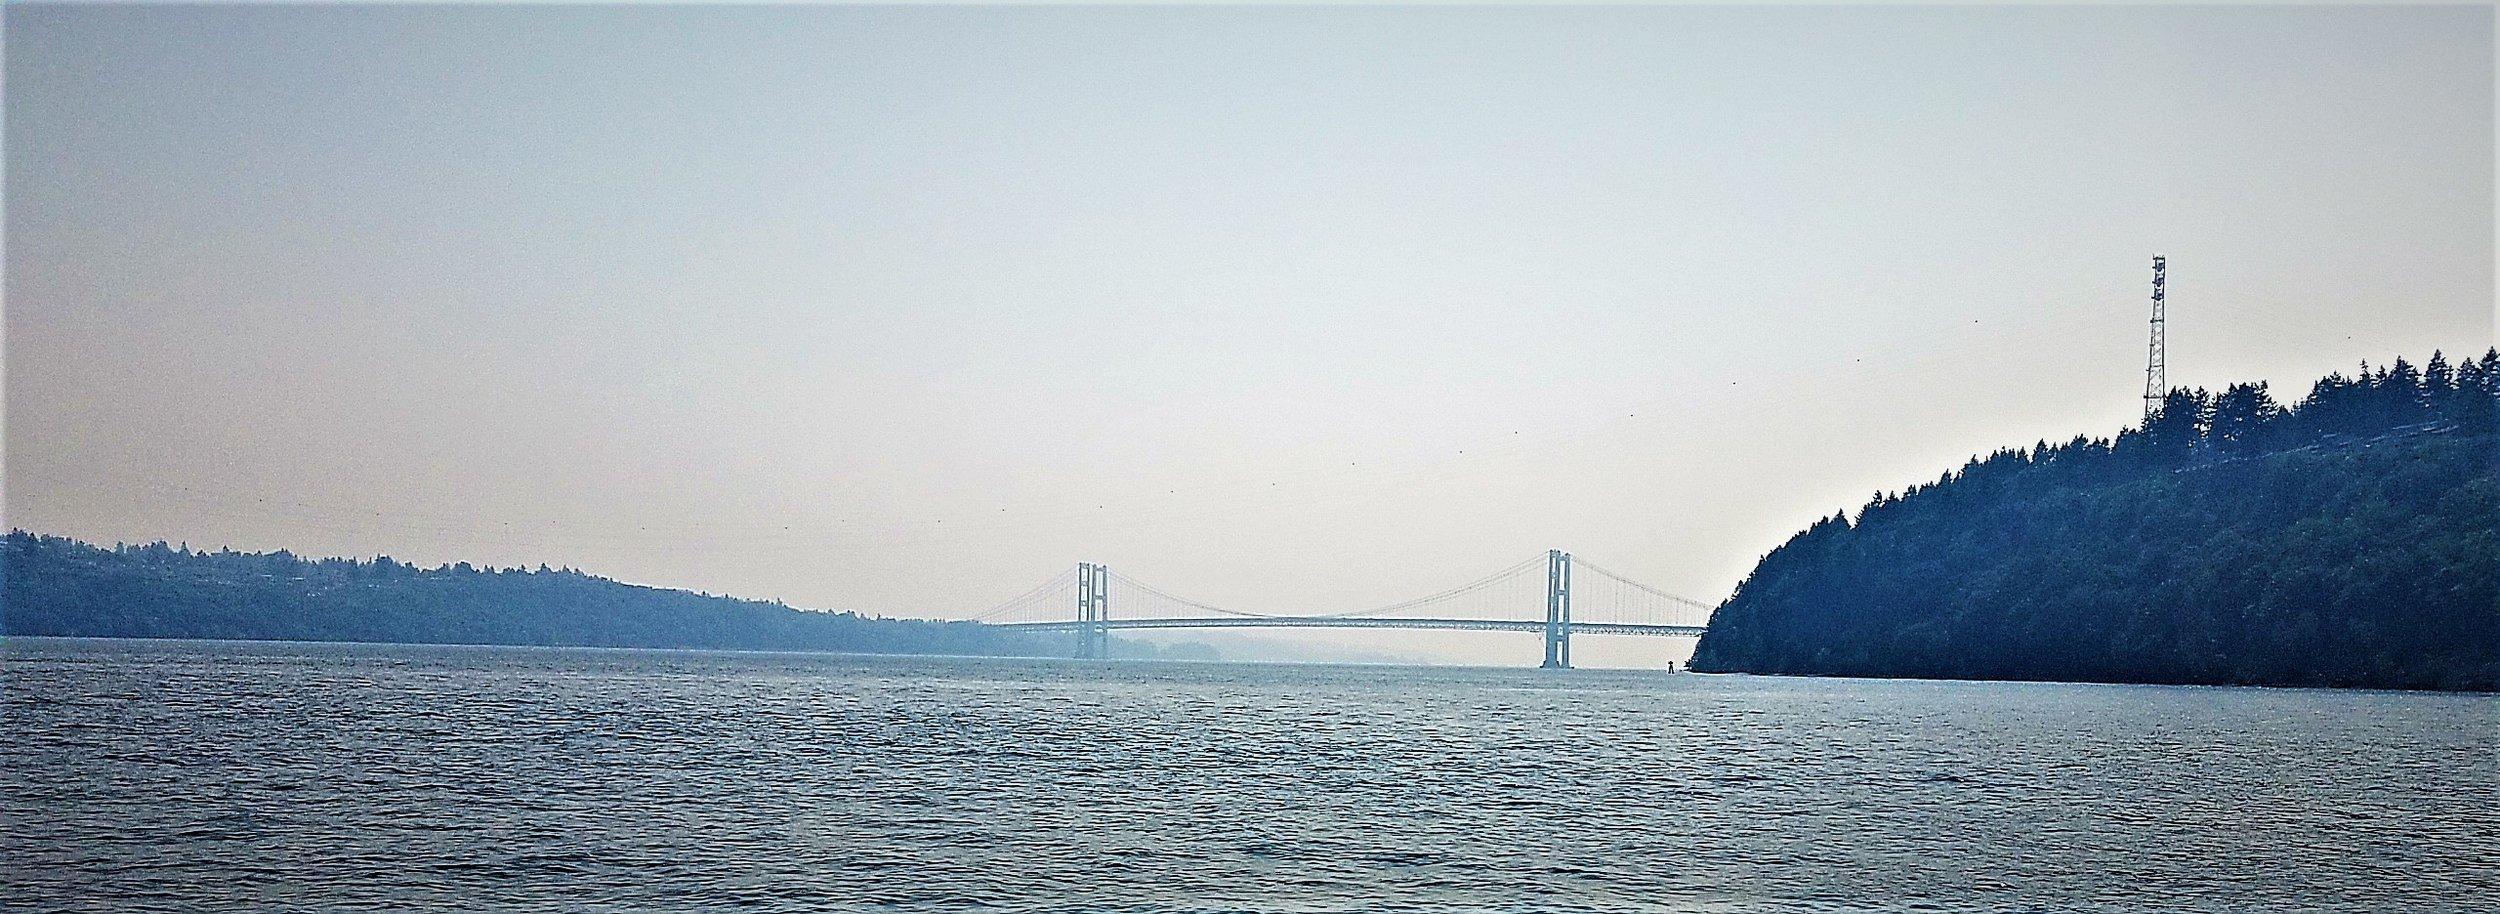 TN Bridge 2.jpg